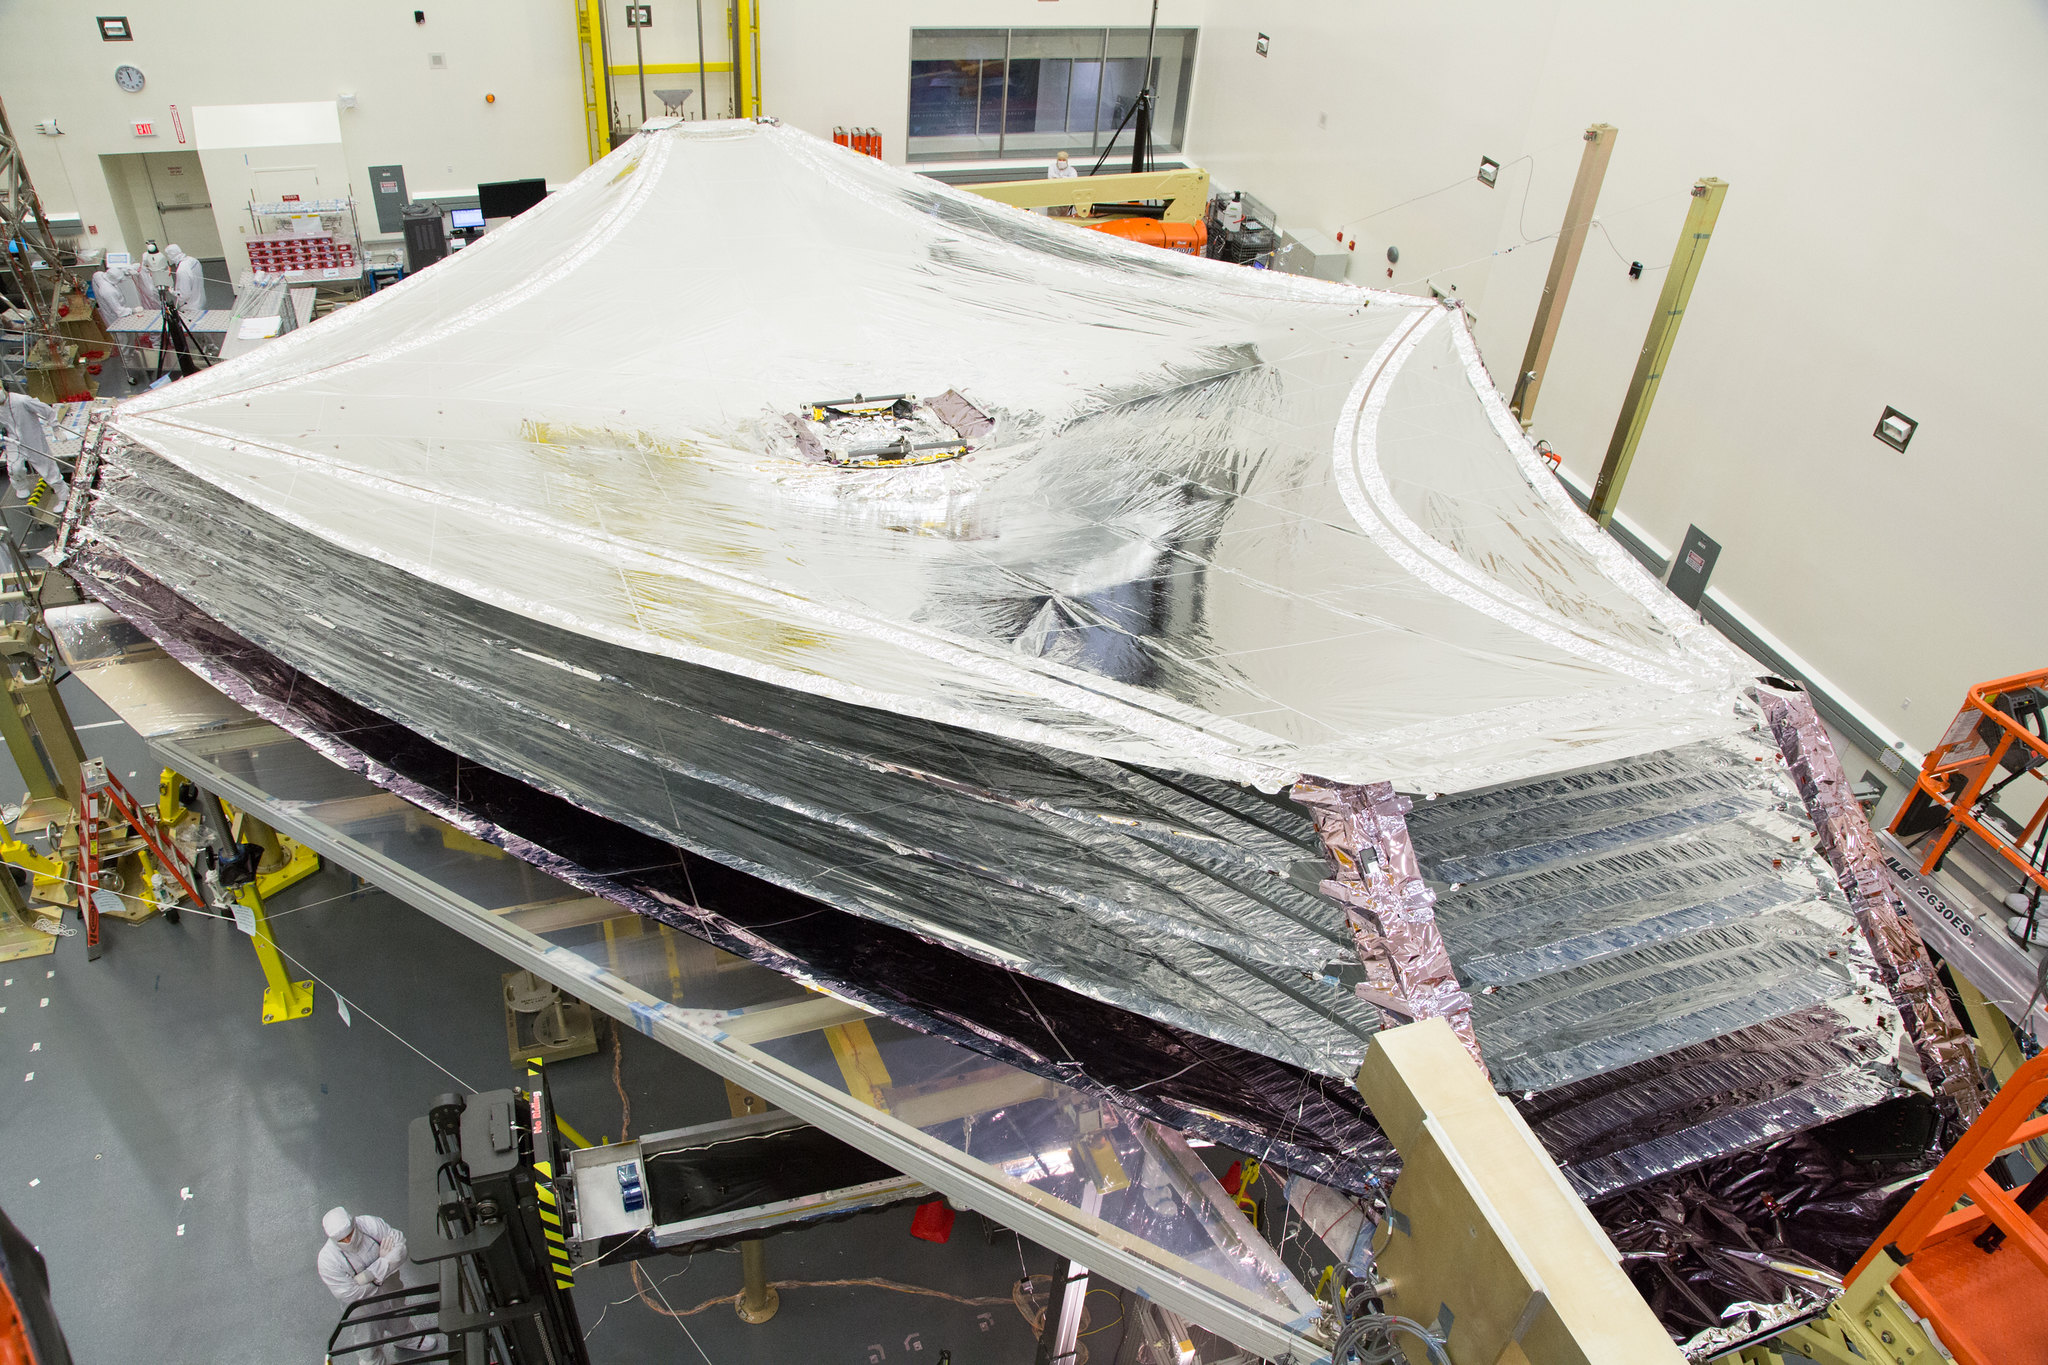 The Flight Sunshield at Northrop Grumman